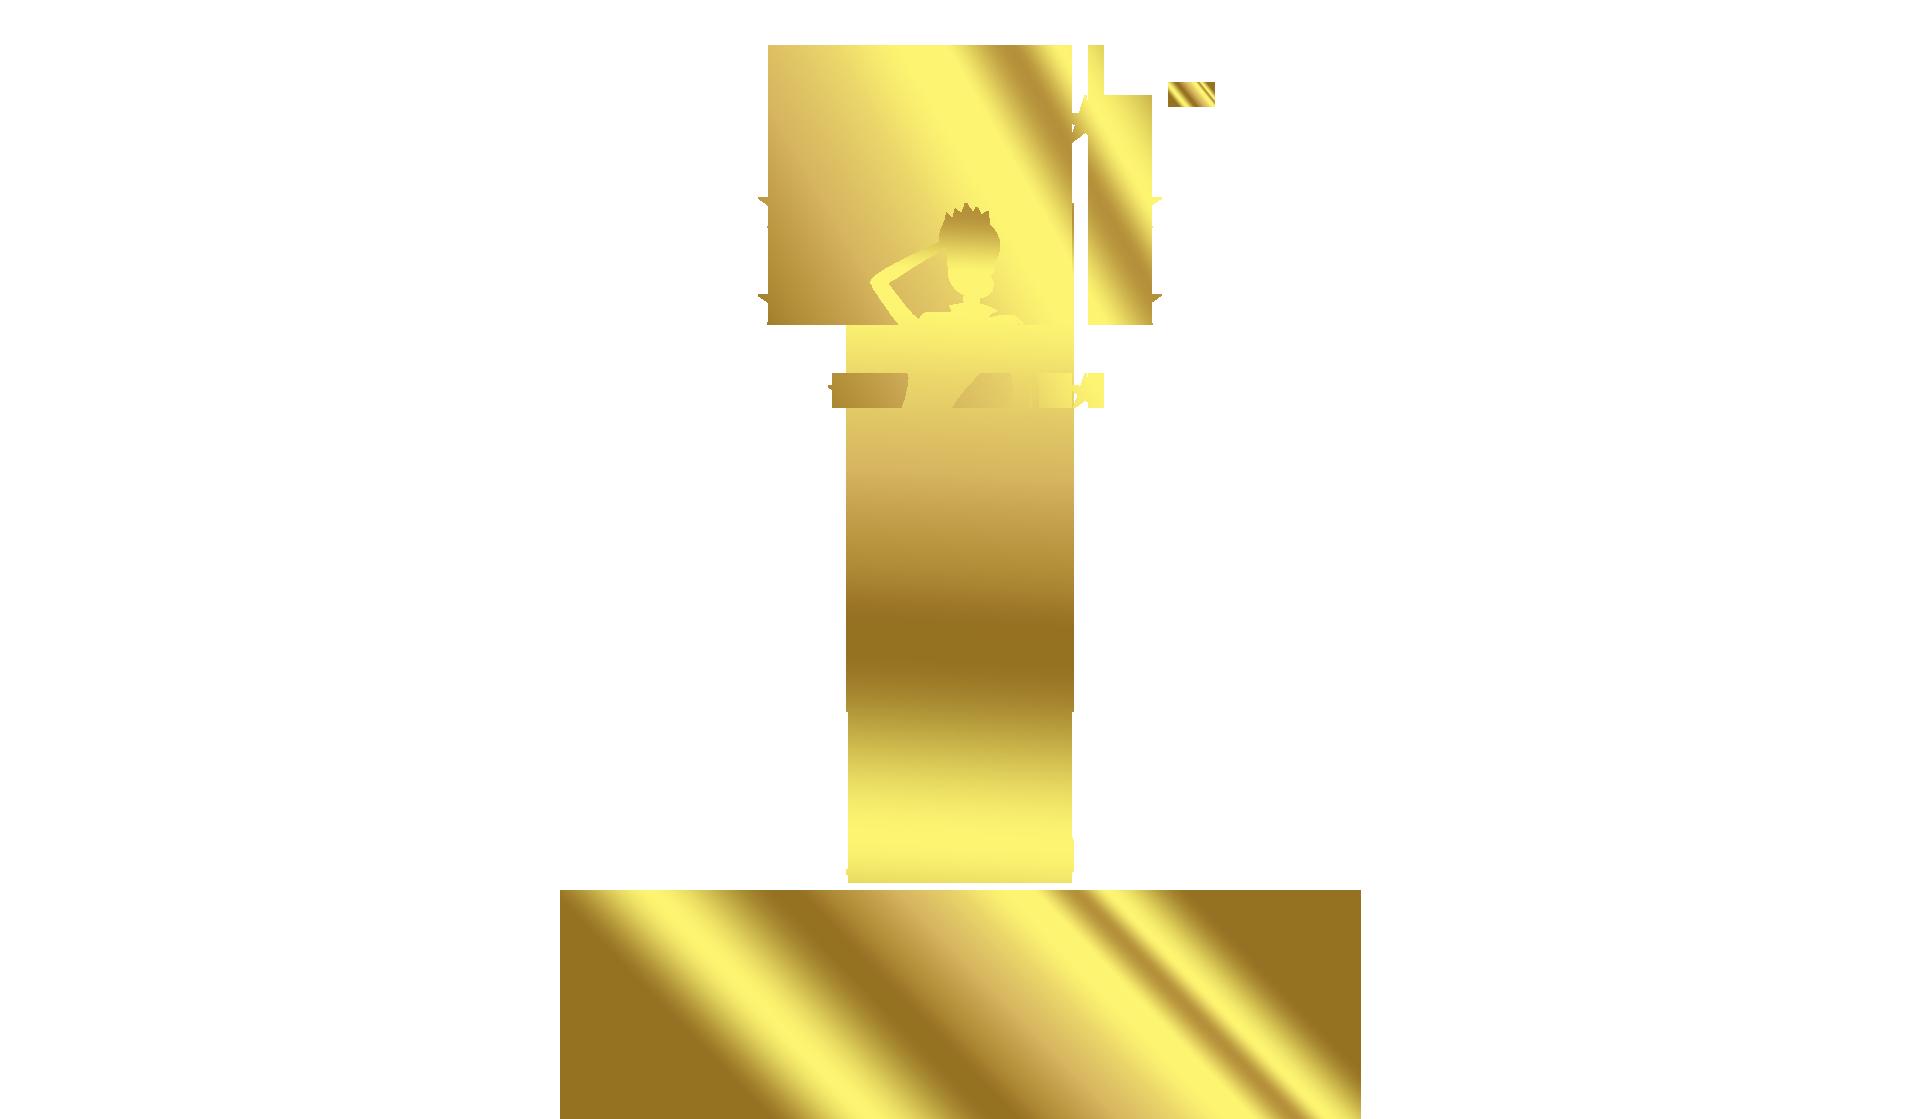 Miss/Mrs Legend Universal Japan